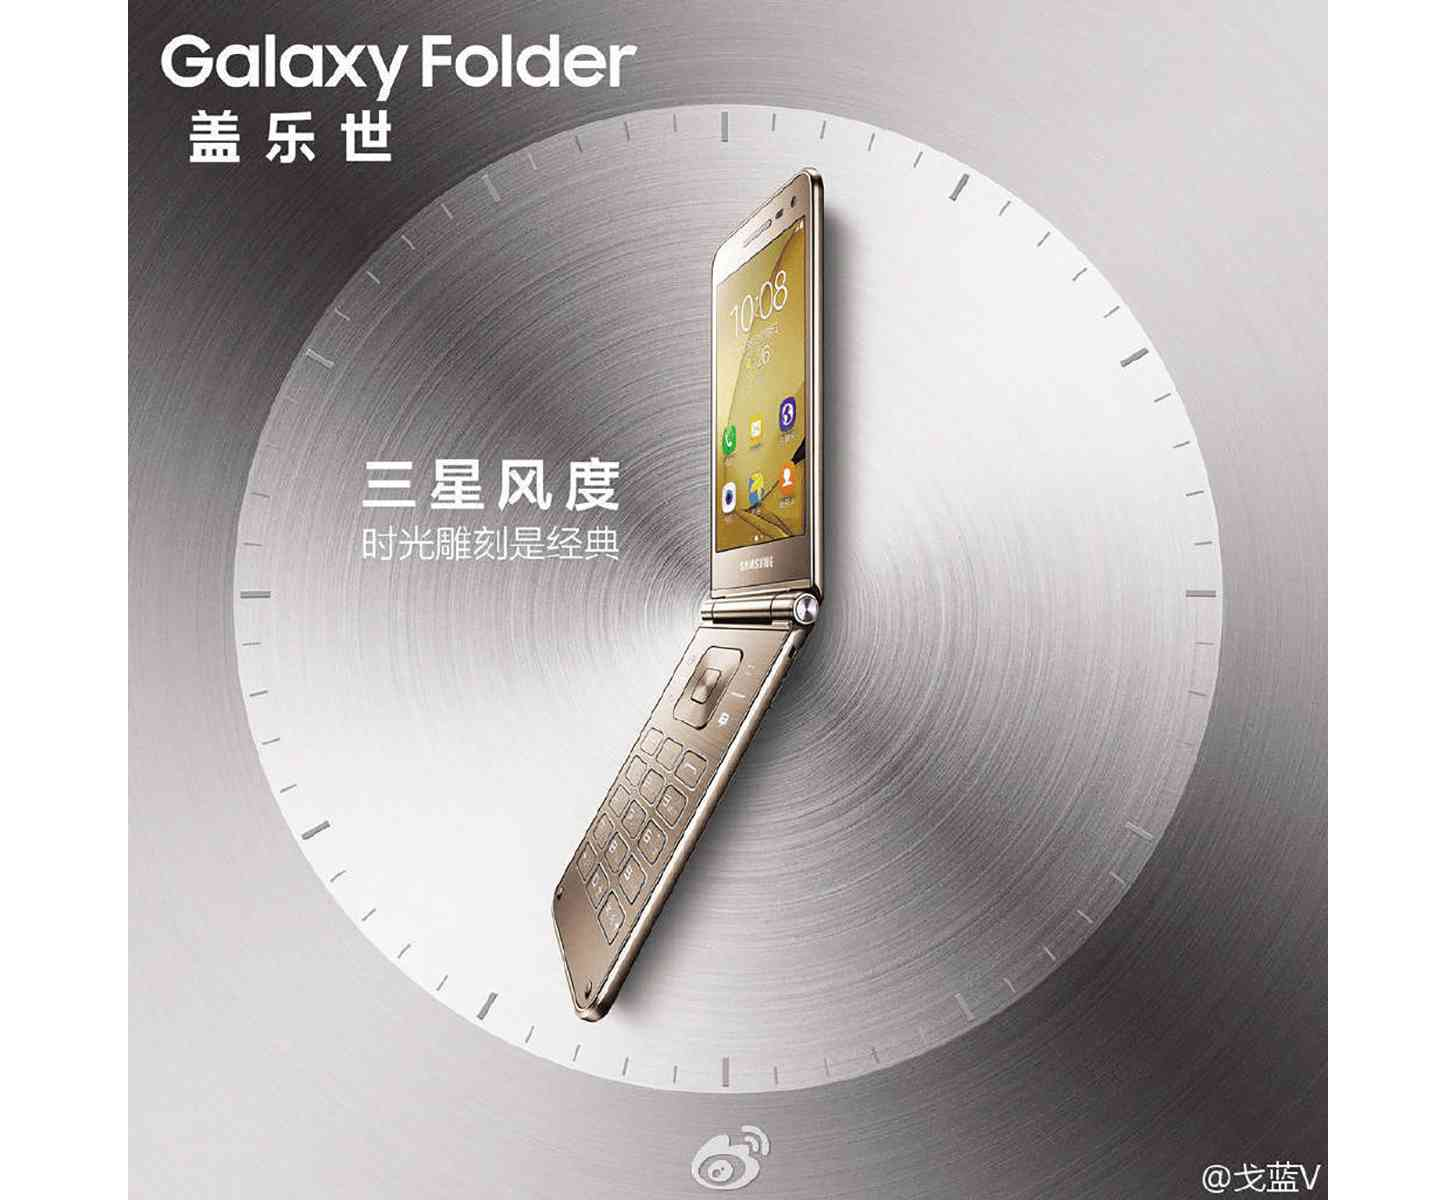 Samsung Galaxy Folder 2 Android flip phone leak